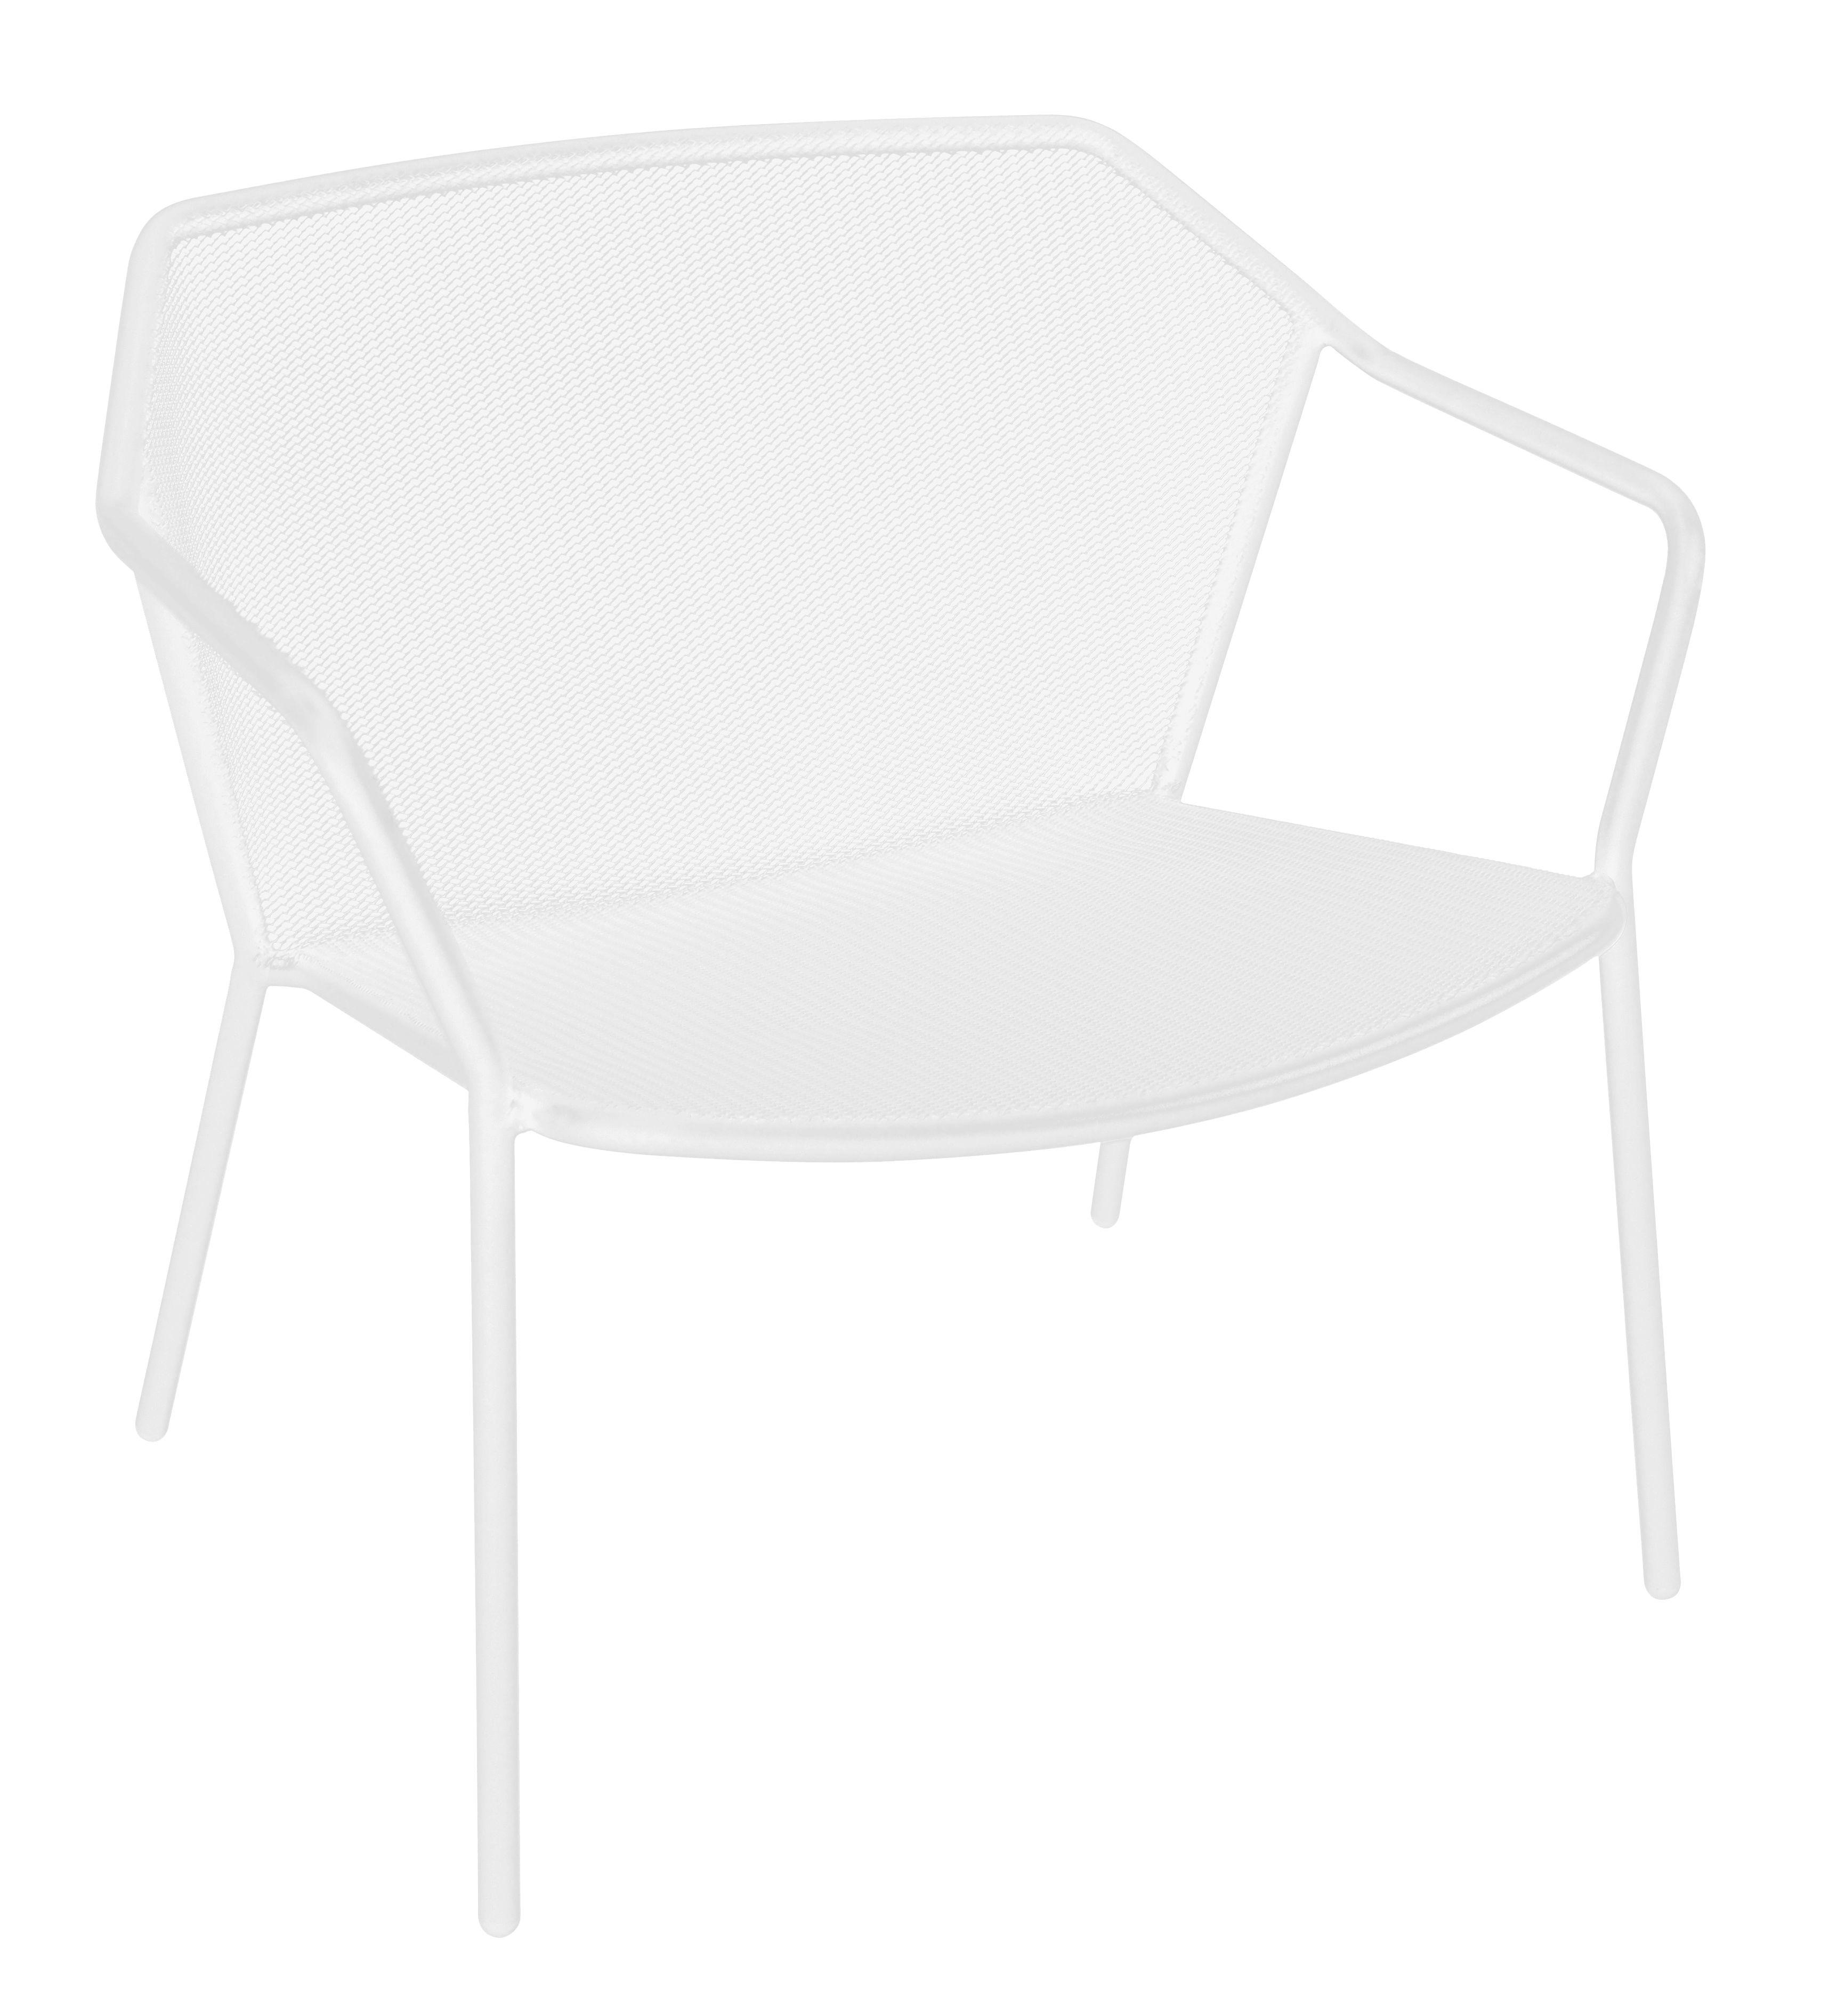 Furniture - Armchairs - Darwin Low armchair - Metal by Emu - White - Varnished steel